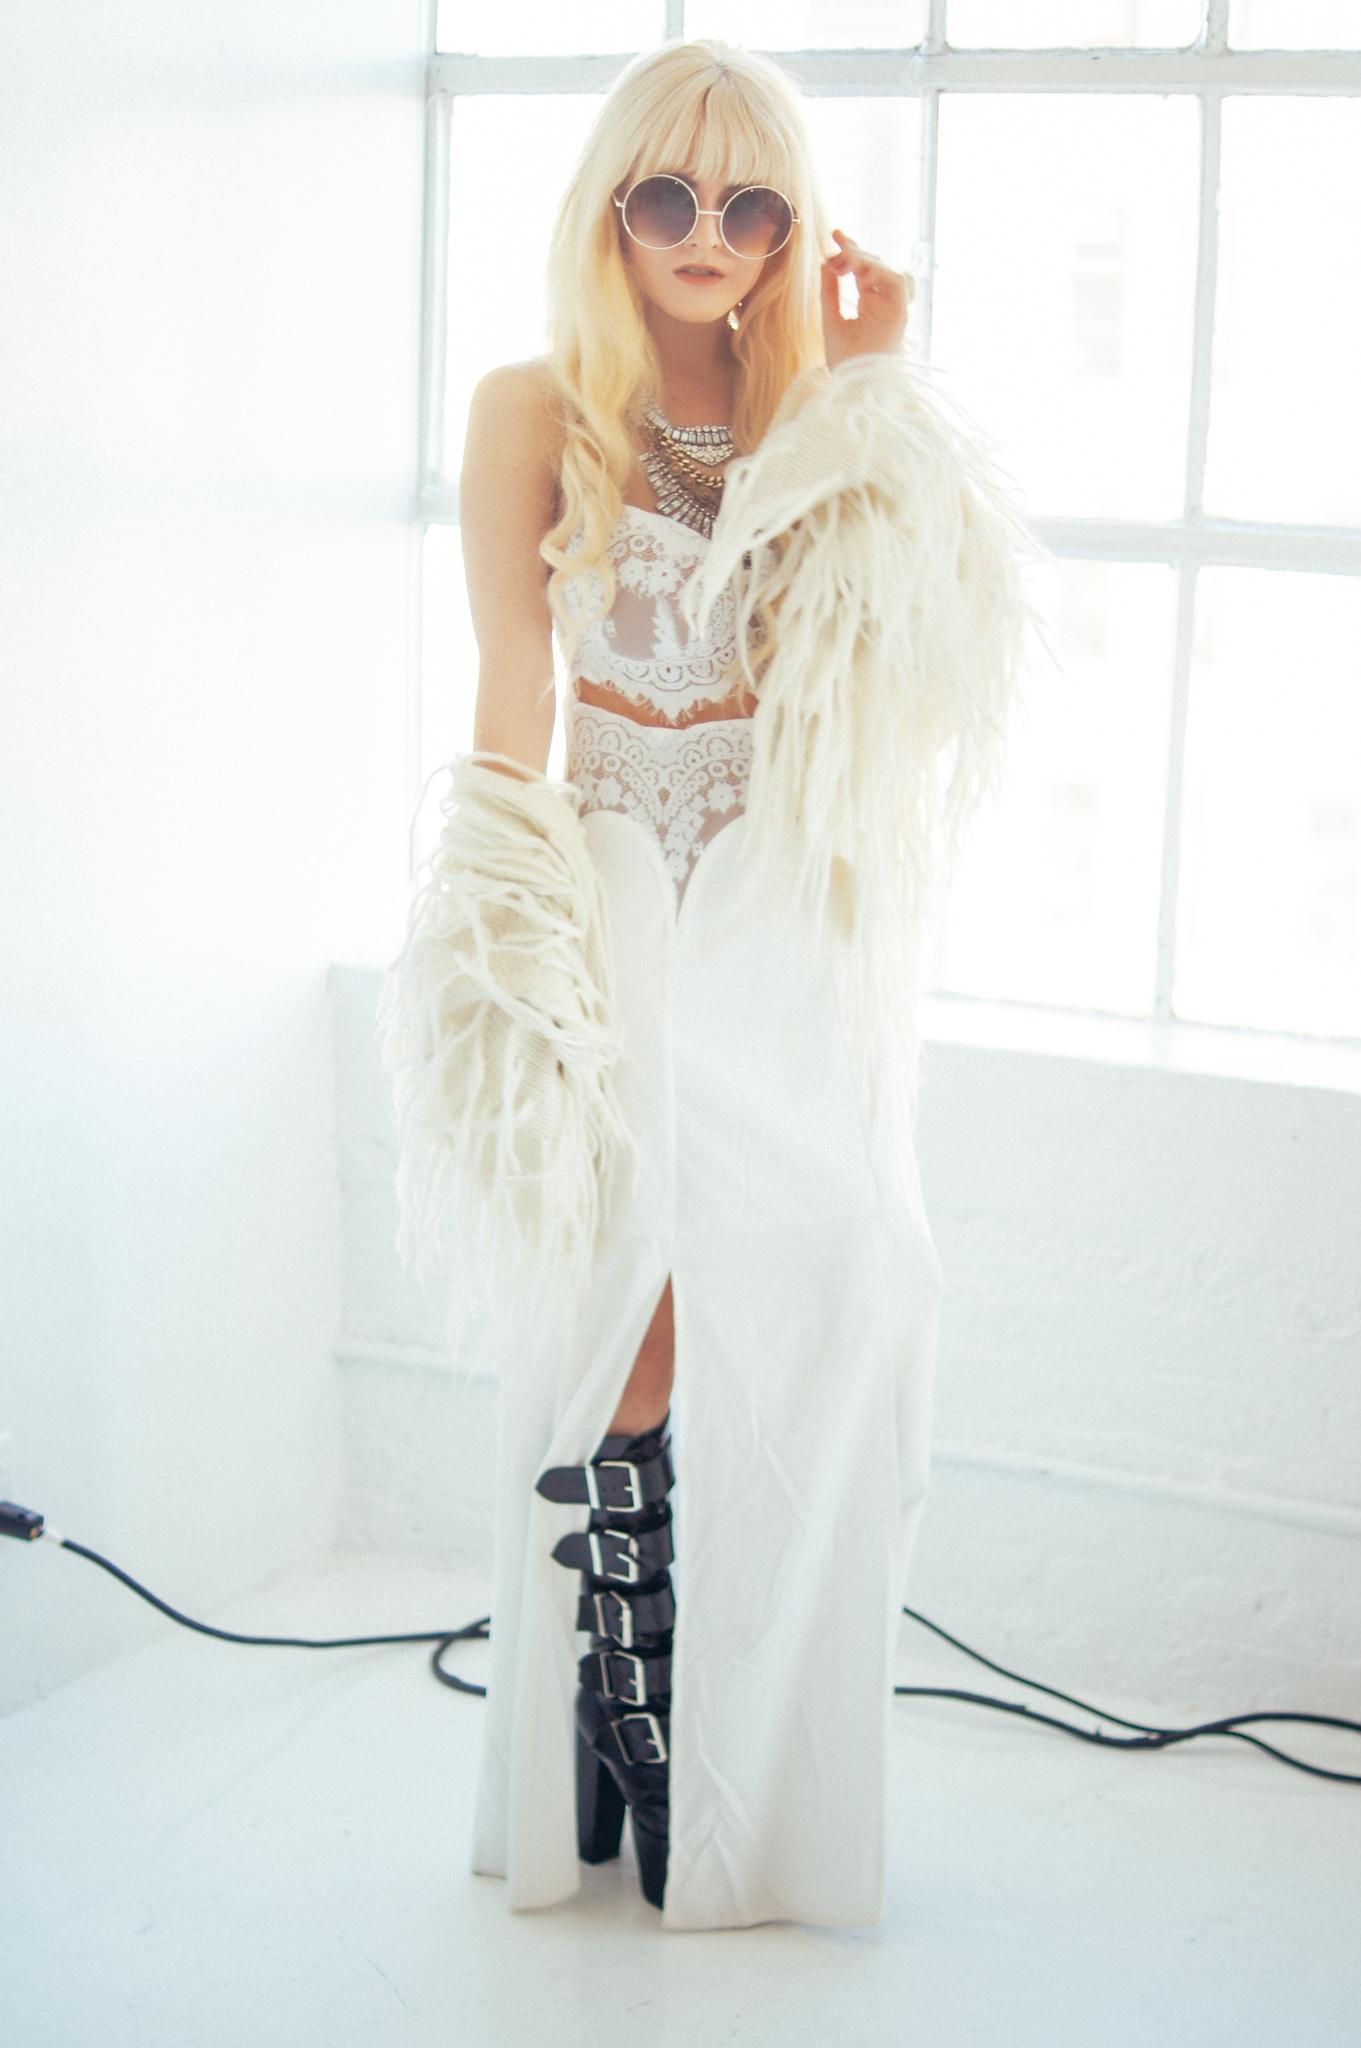 blonde-brittannytaylor-02.jpg